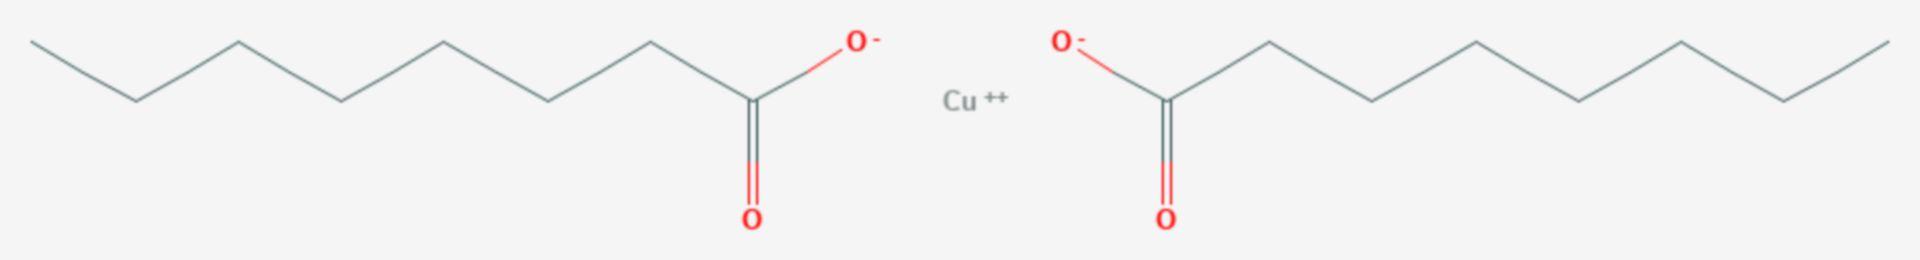 Kupferoctanoat (Strukturformel)